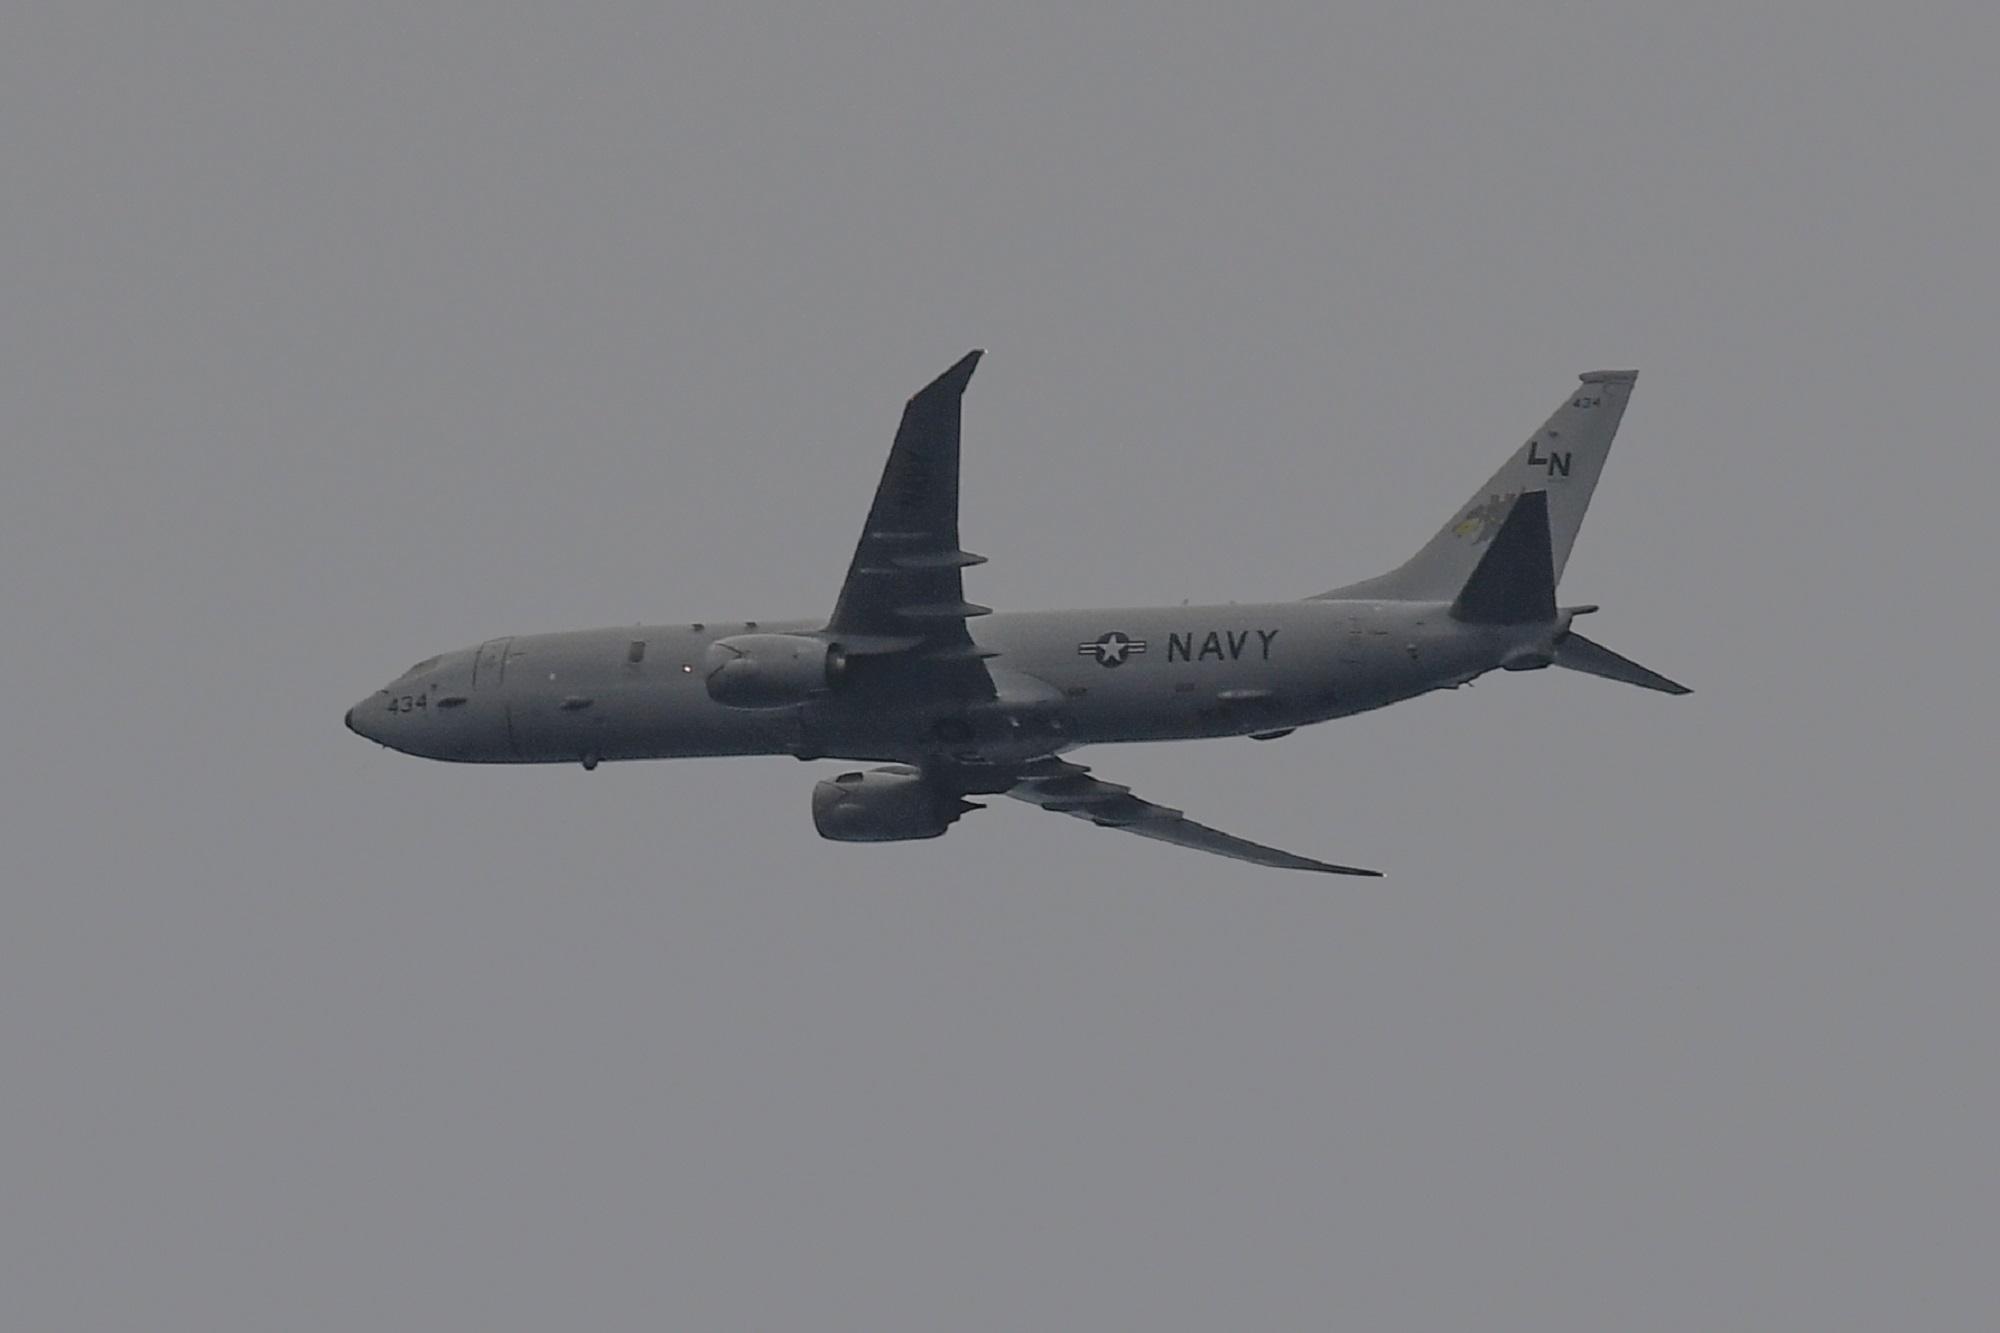 Russian jet buzzes Navy aircraft, causing 'violent turbulence'